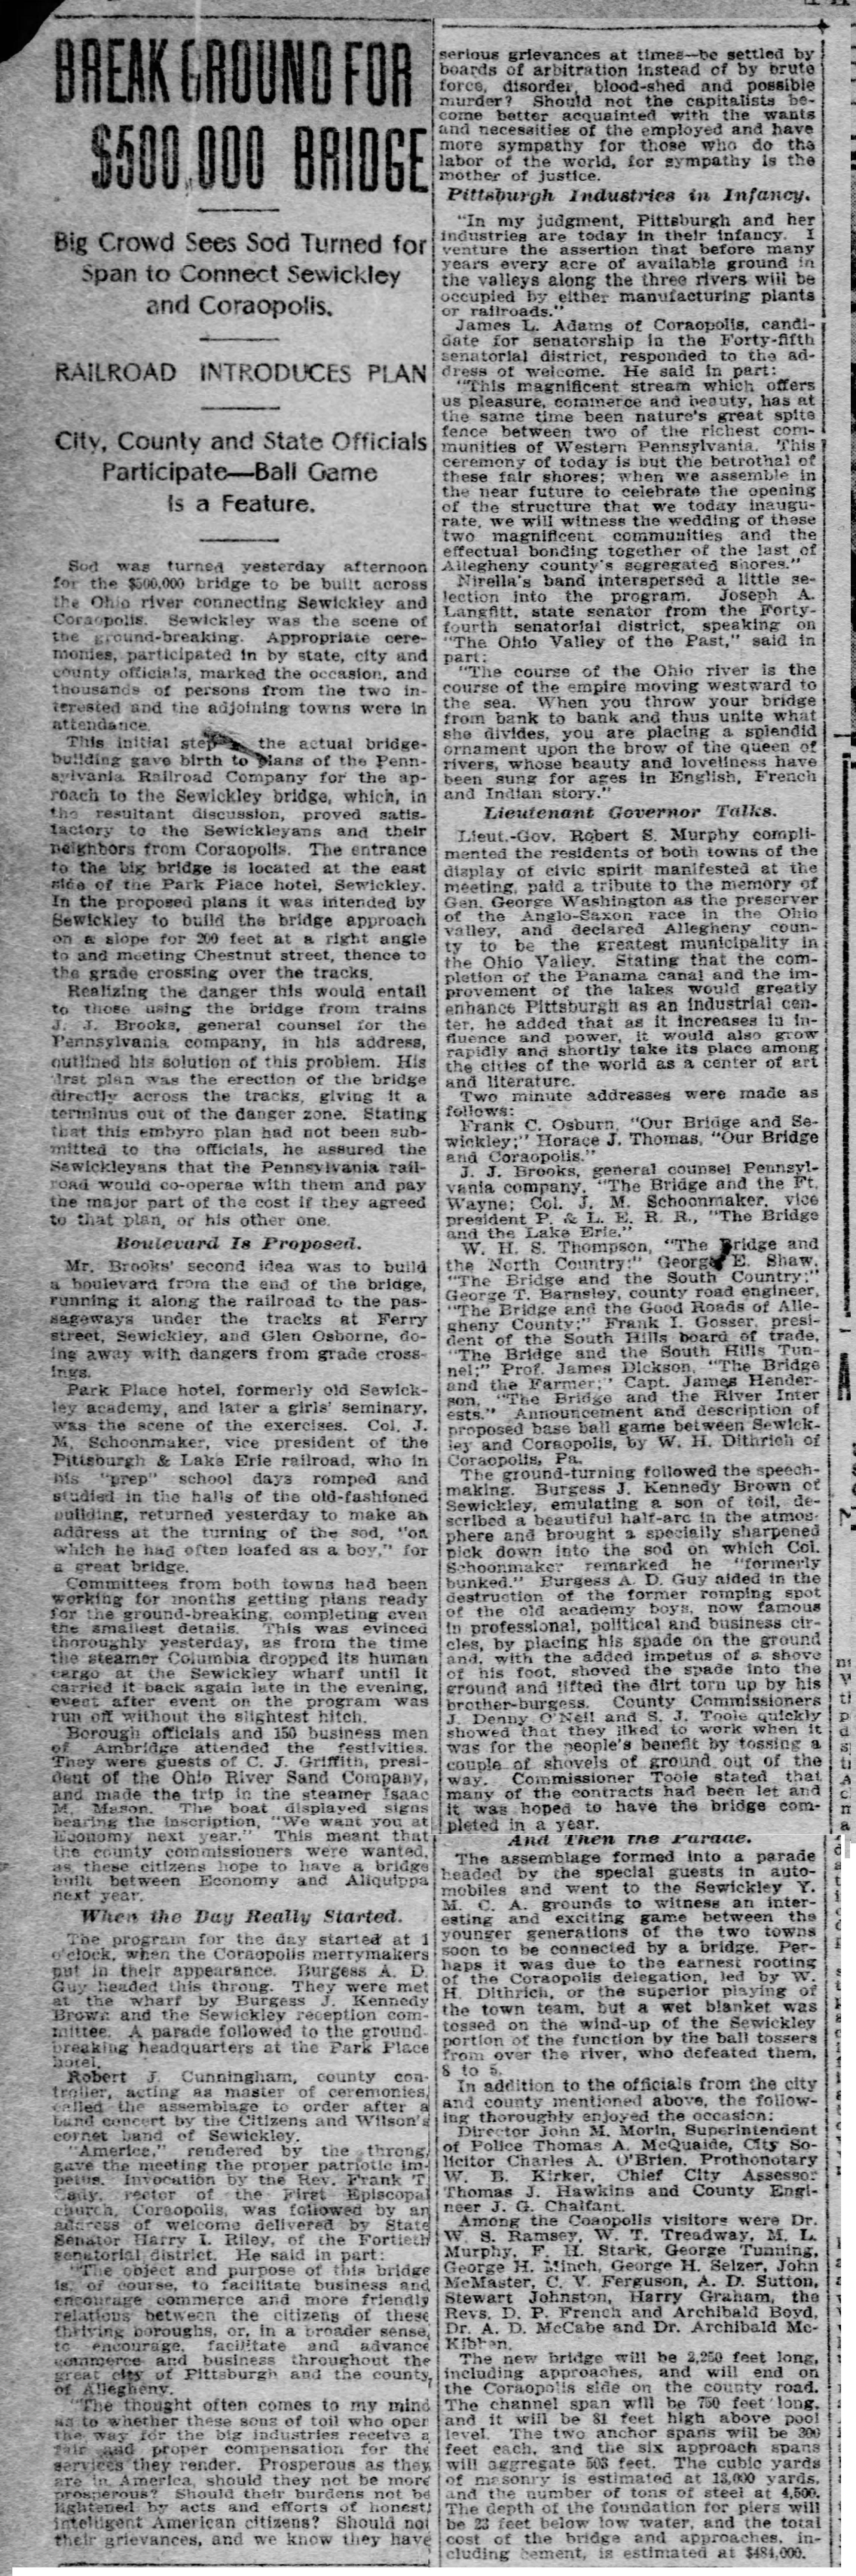 1909-07-22 The Pittsburgh Gazette-Times (p2).jpg